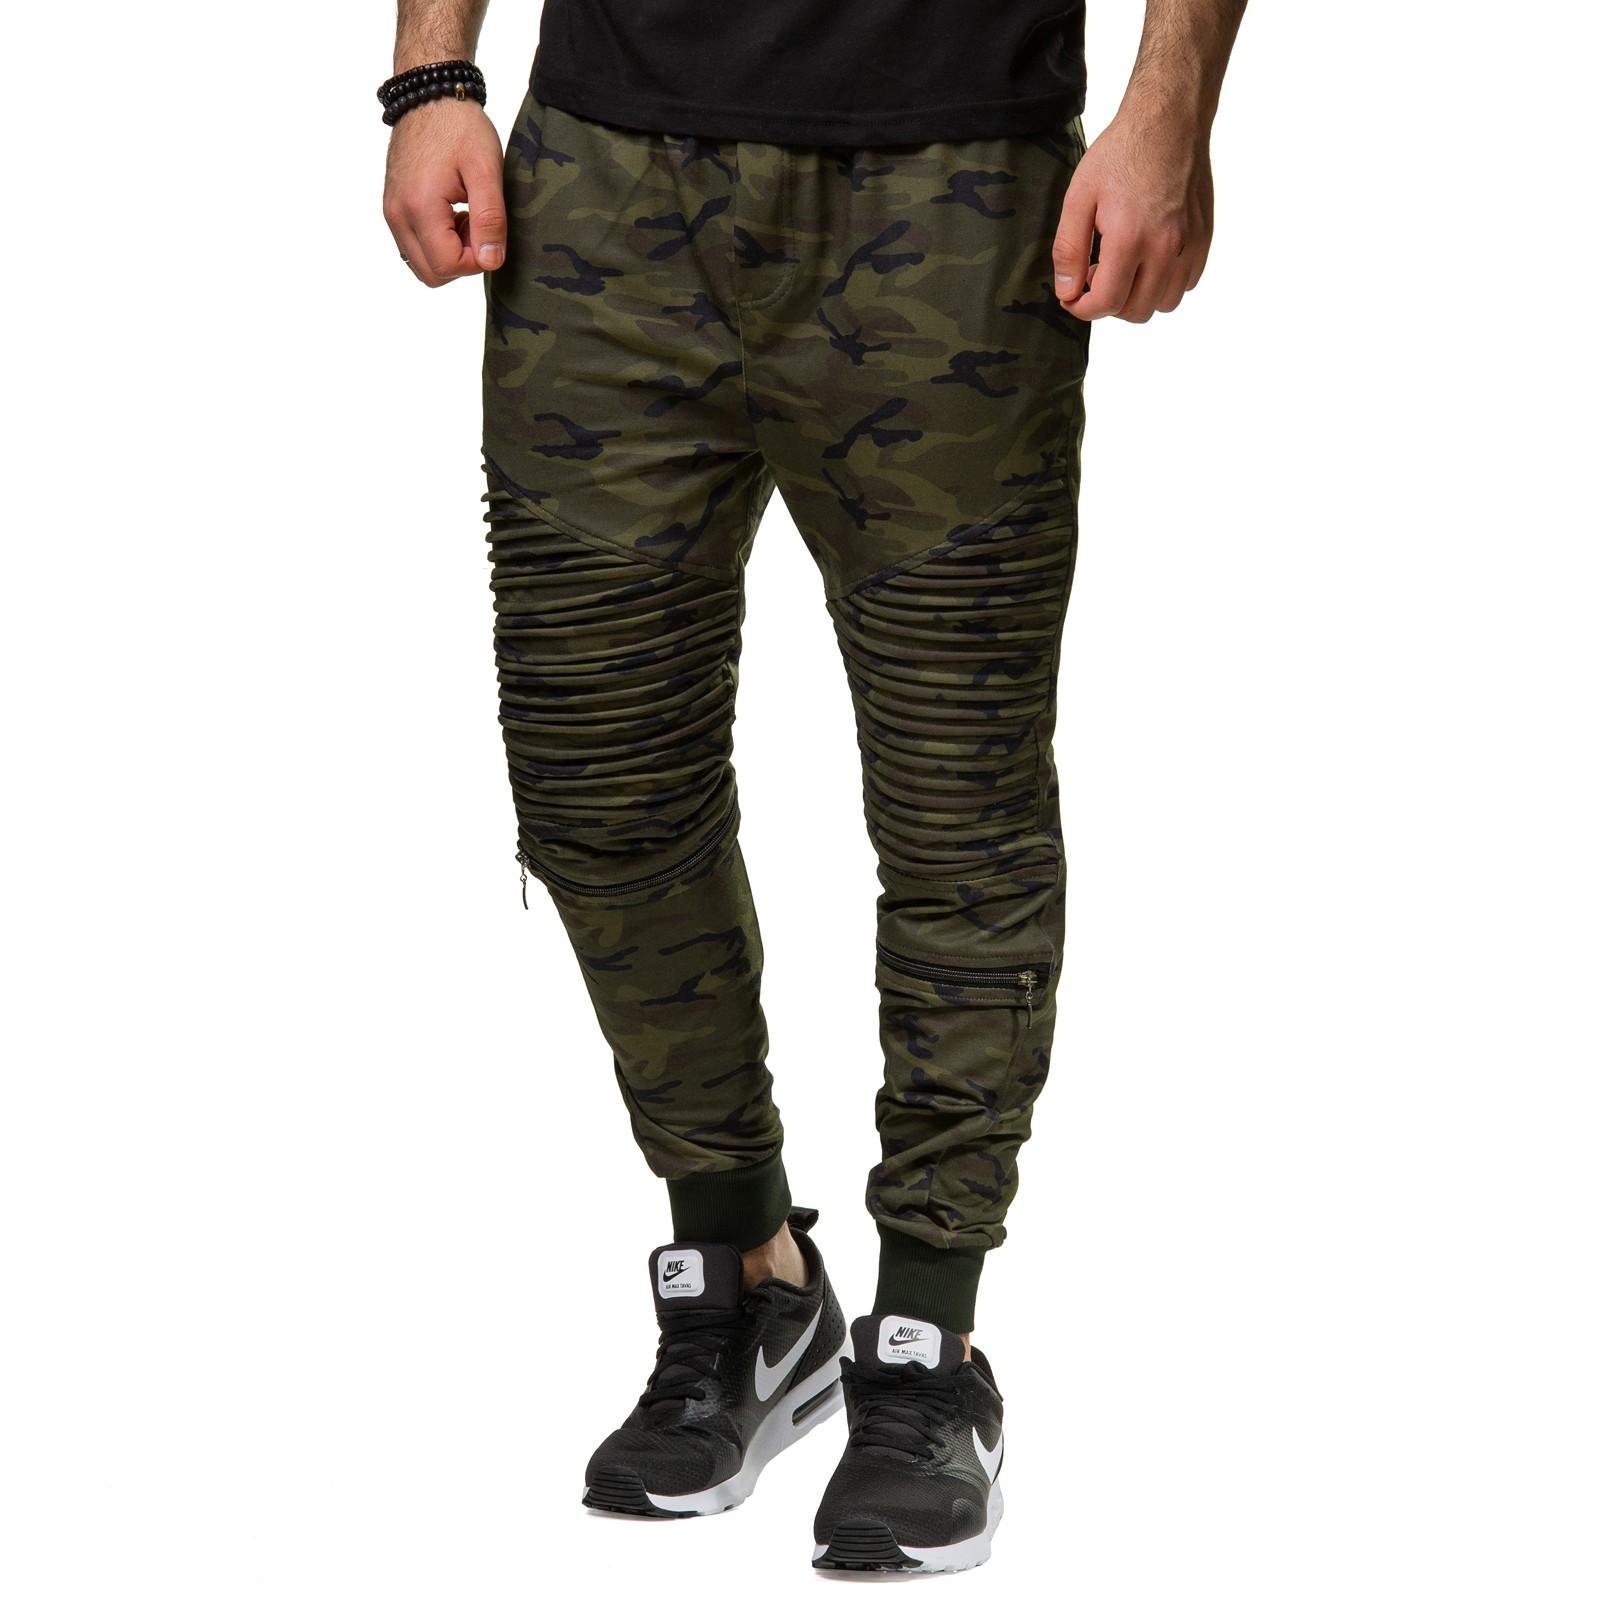 ci borg 568 jogginghose zipper stepp hose camouflage pant. Black Bedroom Furniture Sets. Home Design Ideas